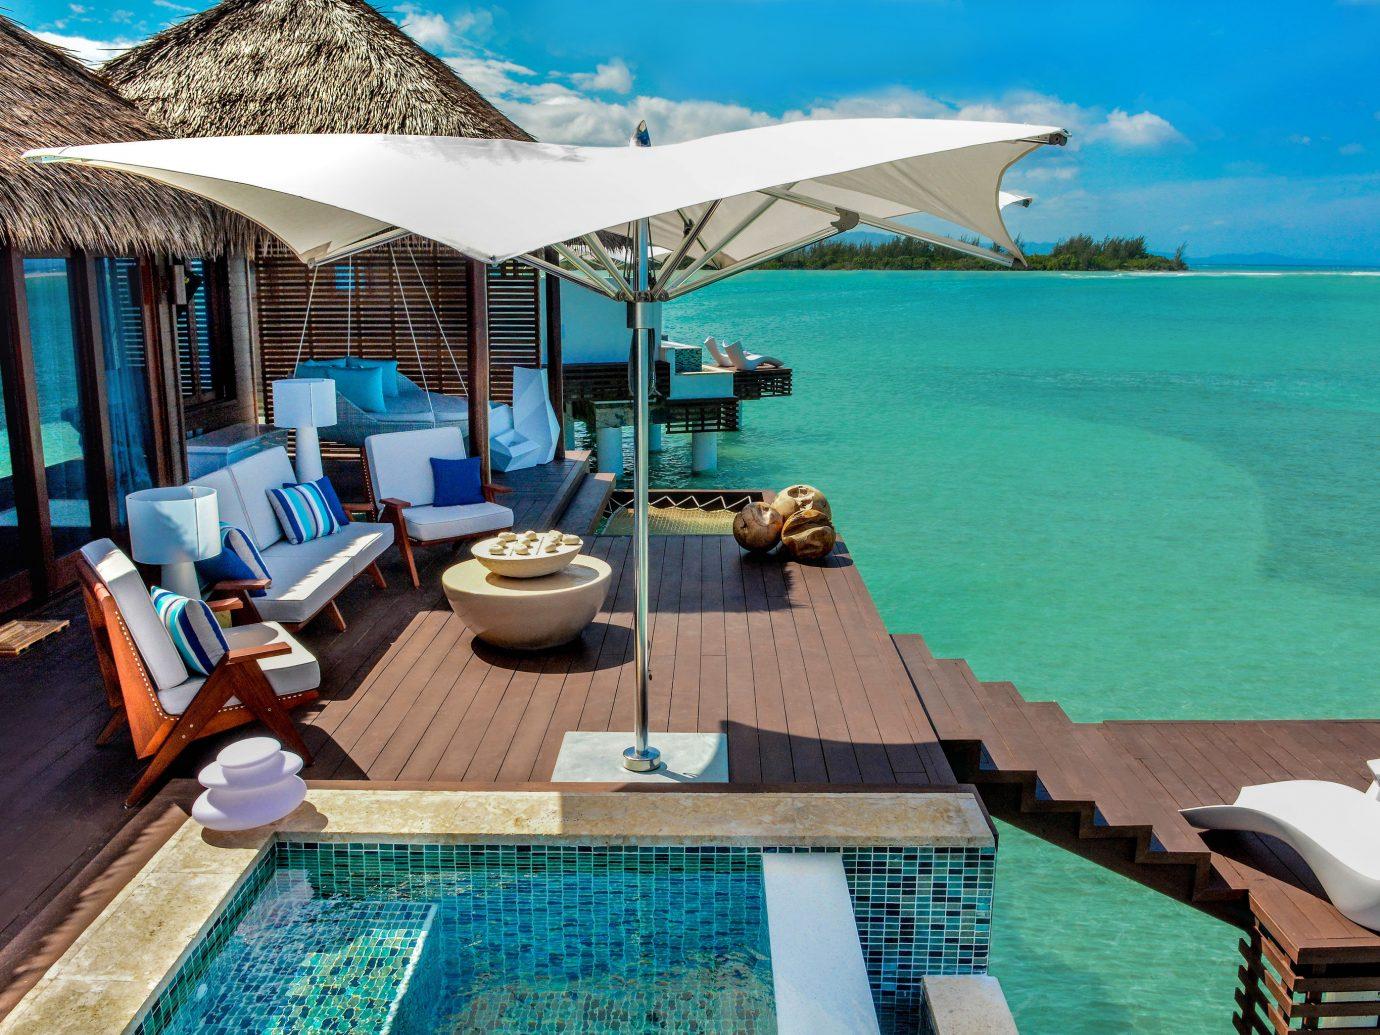 All-Inclusive Resorts Hotels Trip Ideas water leisure swimming pool caribbean vacation Resort Sea estate Beach Villa furniture